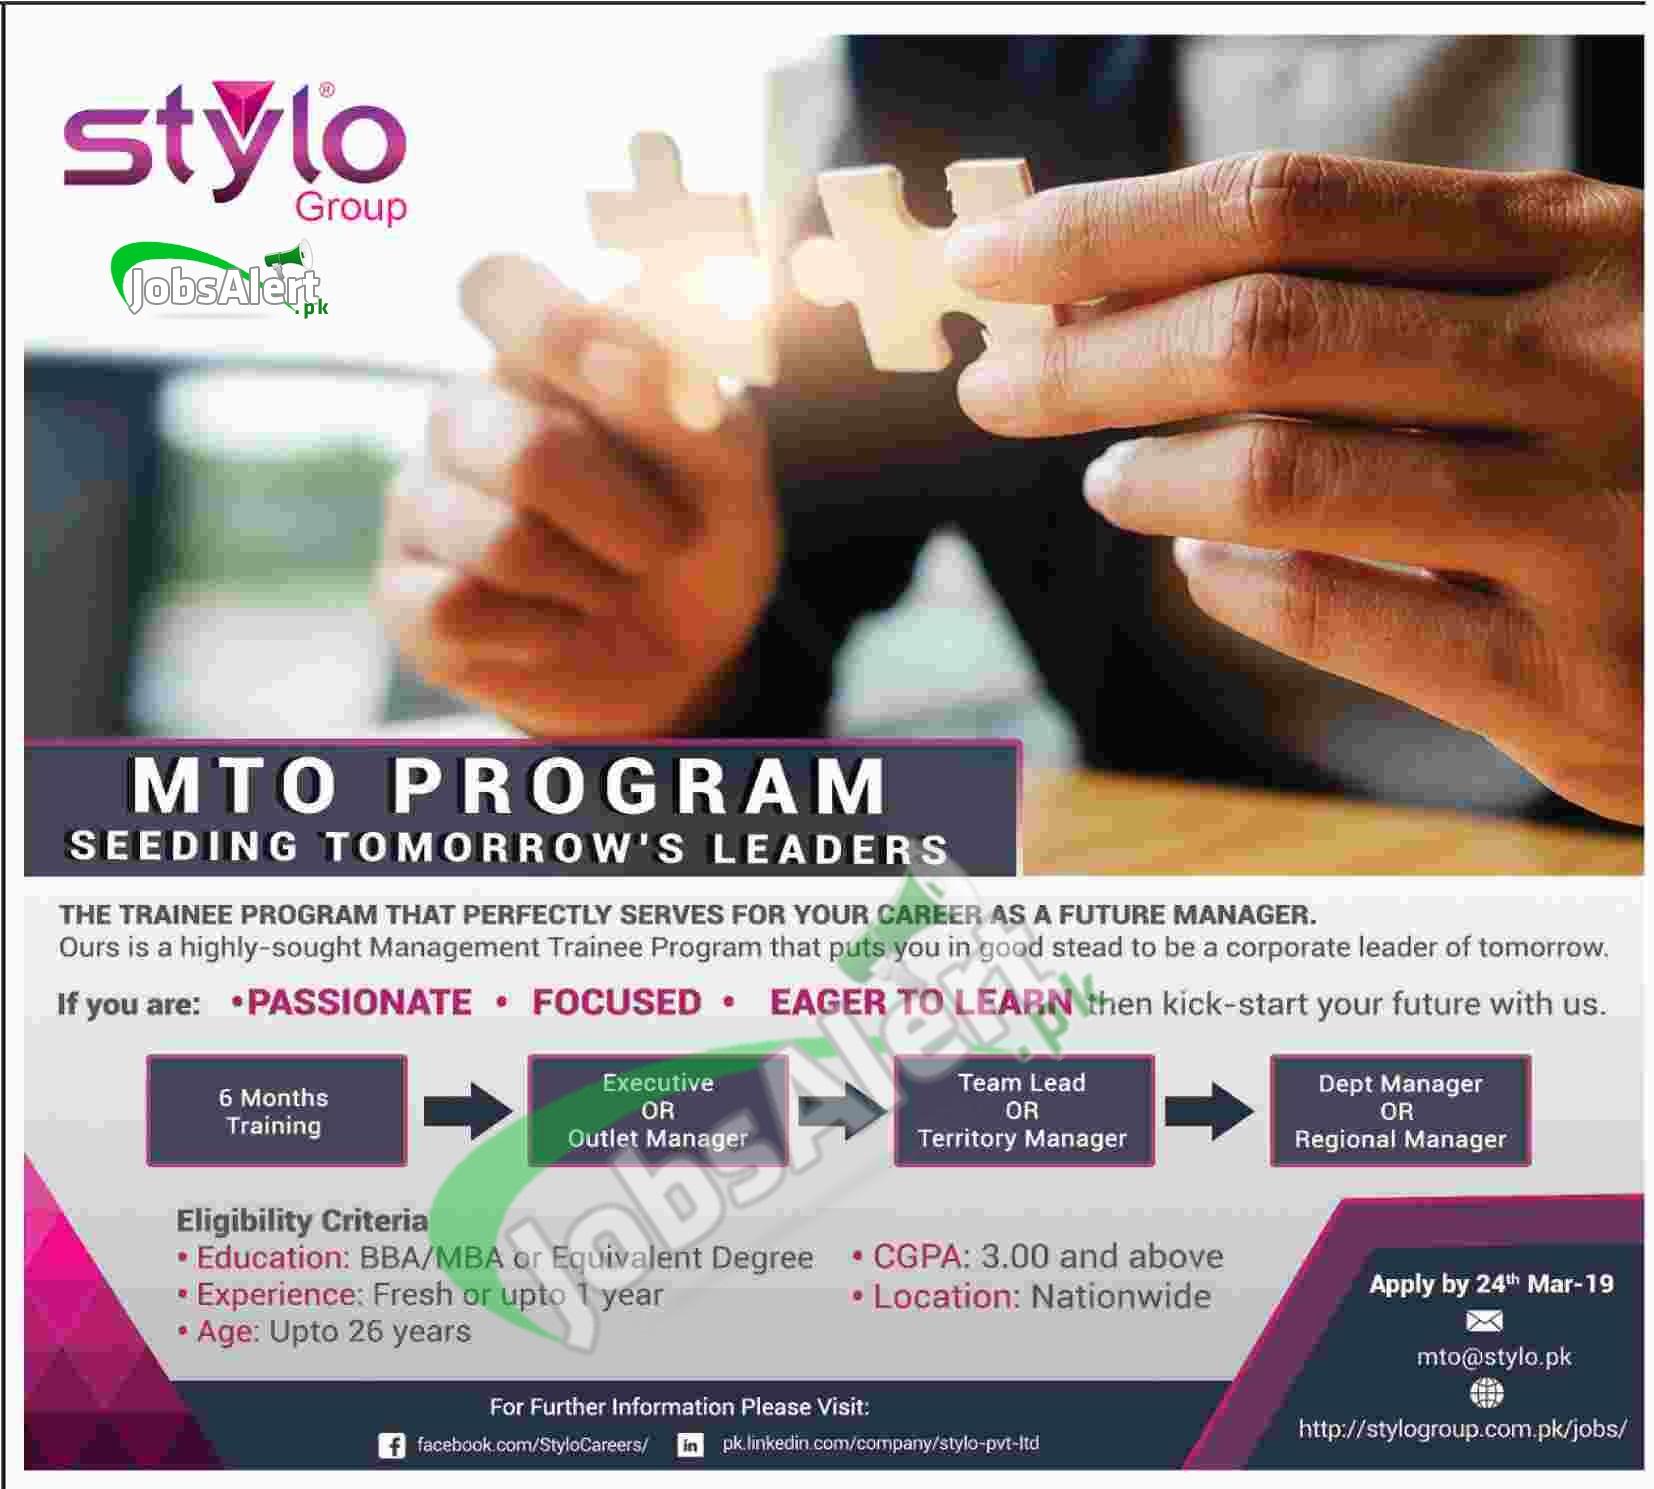 Stylo MTO Program